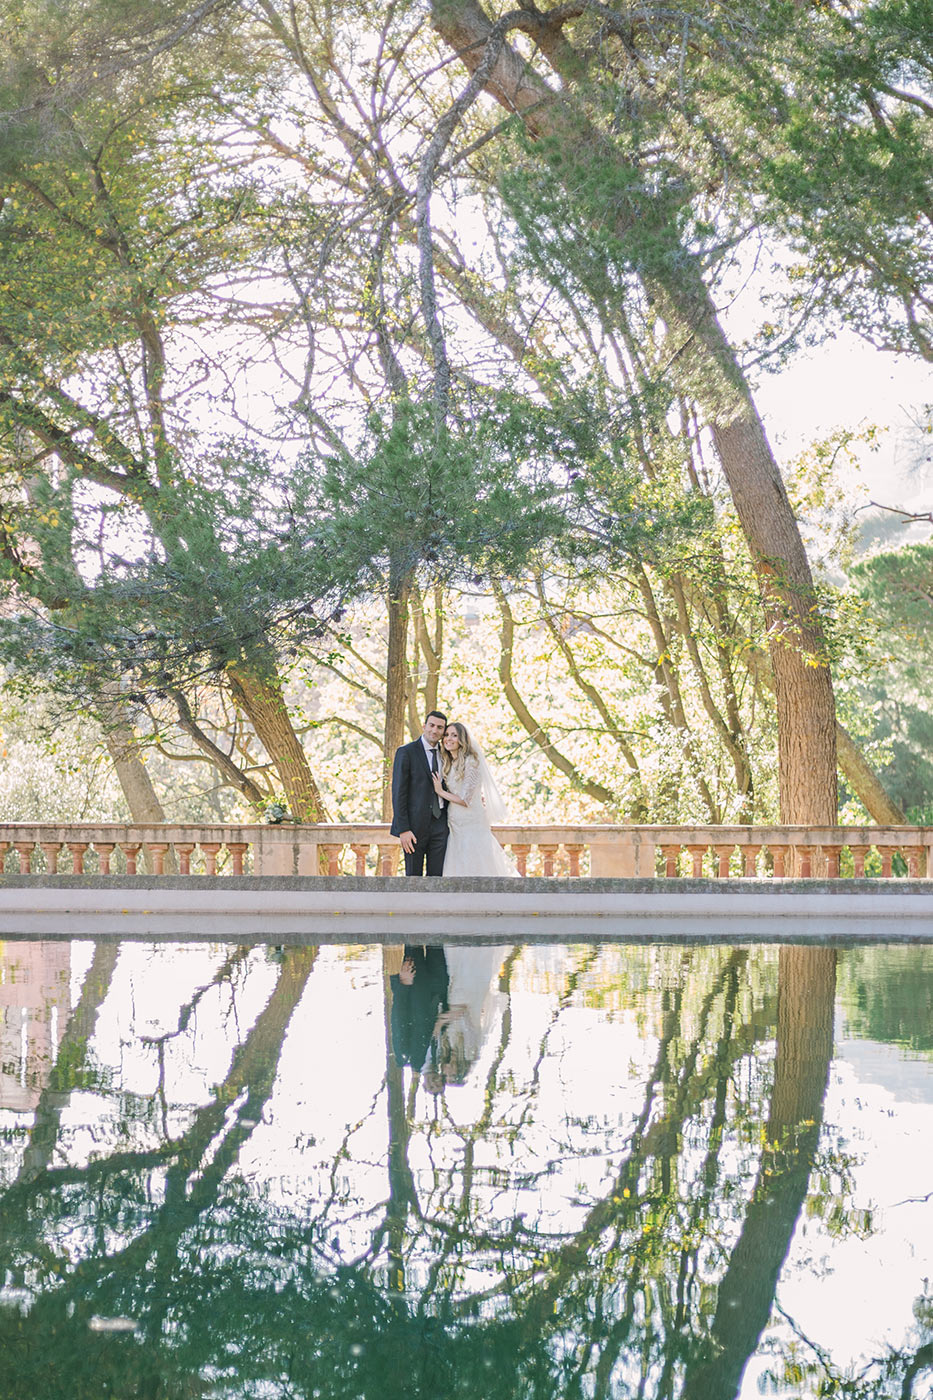 Enghagement photo in Barcelona | Fine Art Photographer | Lena Karelova Photography | Destination Wedding Photographer Barcelona |Film Wedding Photographer